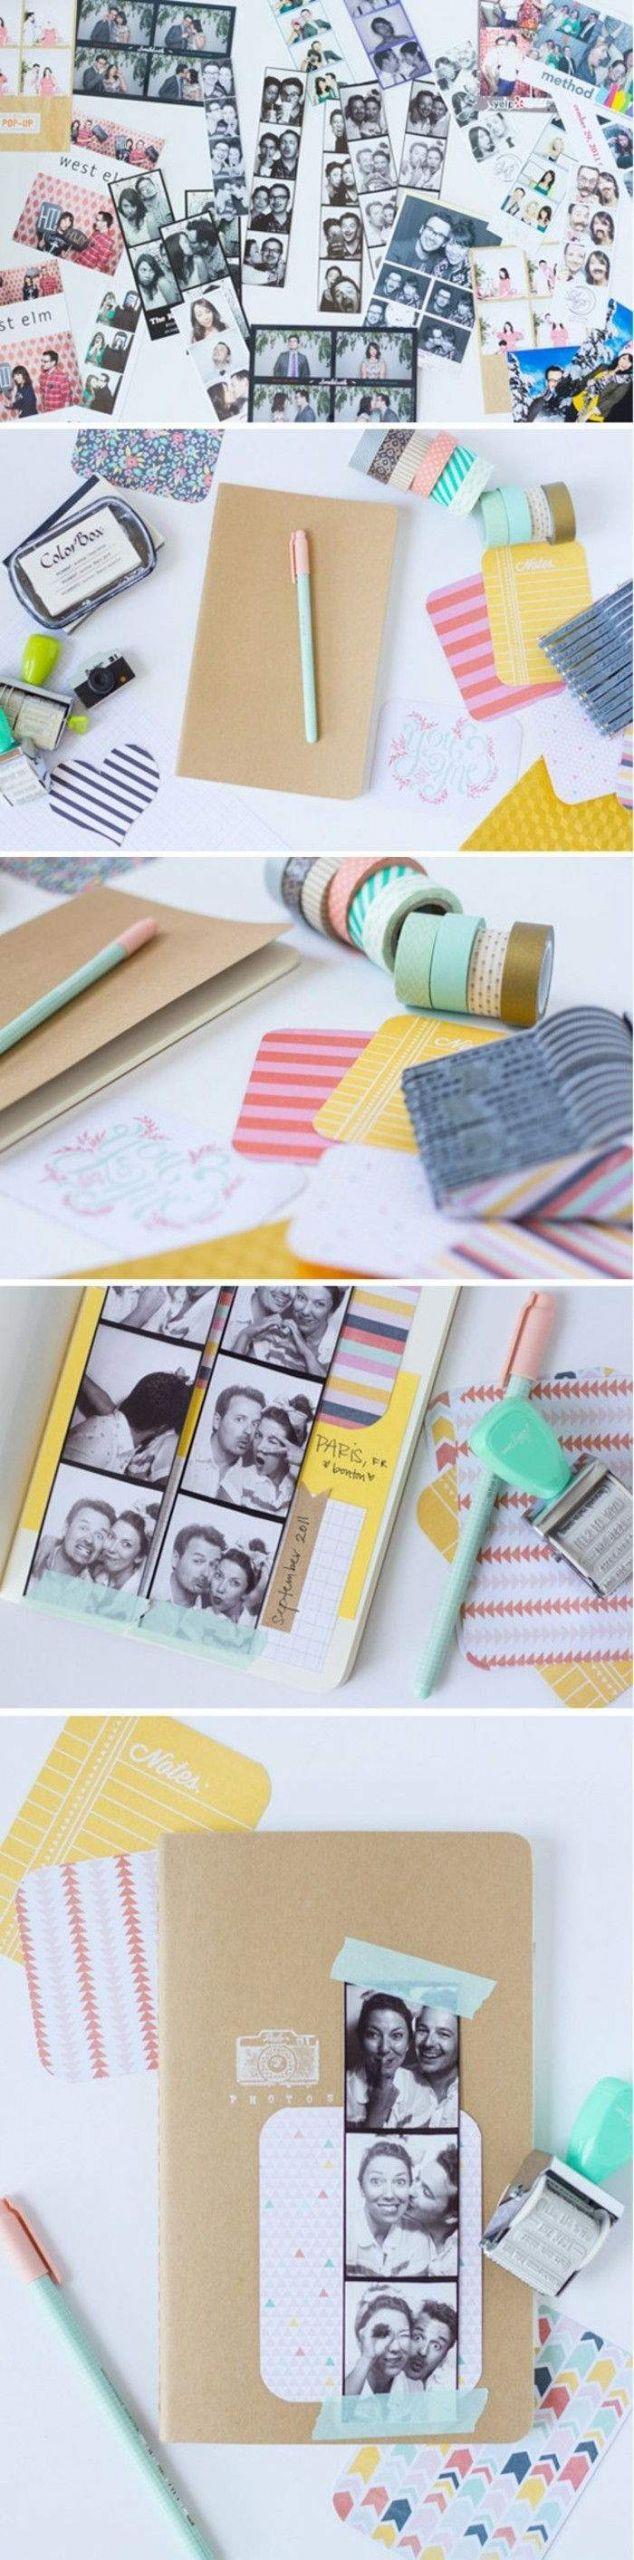 fotowand selber machen washi tape ideen dekoration